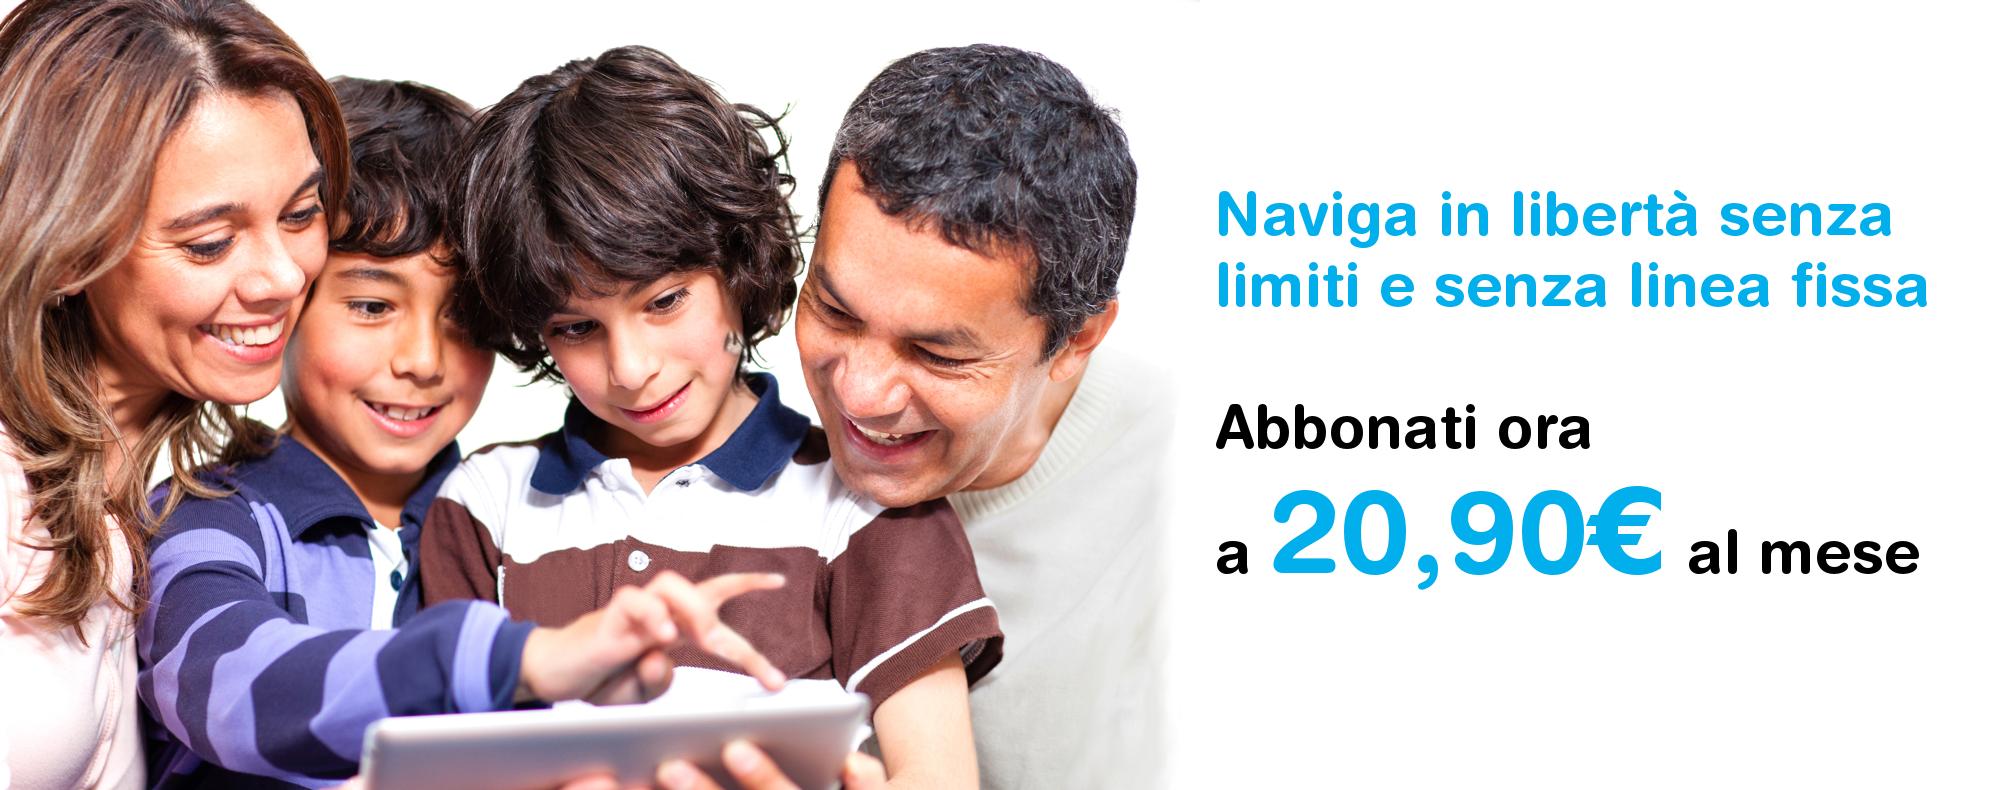 family-tablet-1200x804px-150dpi11